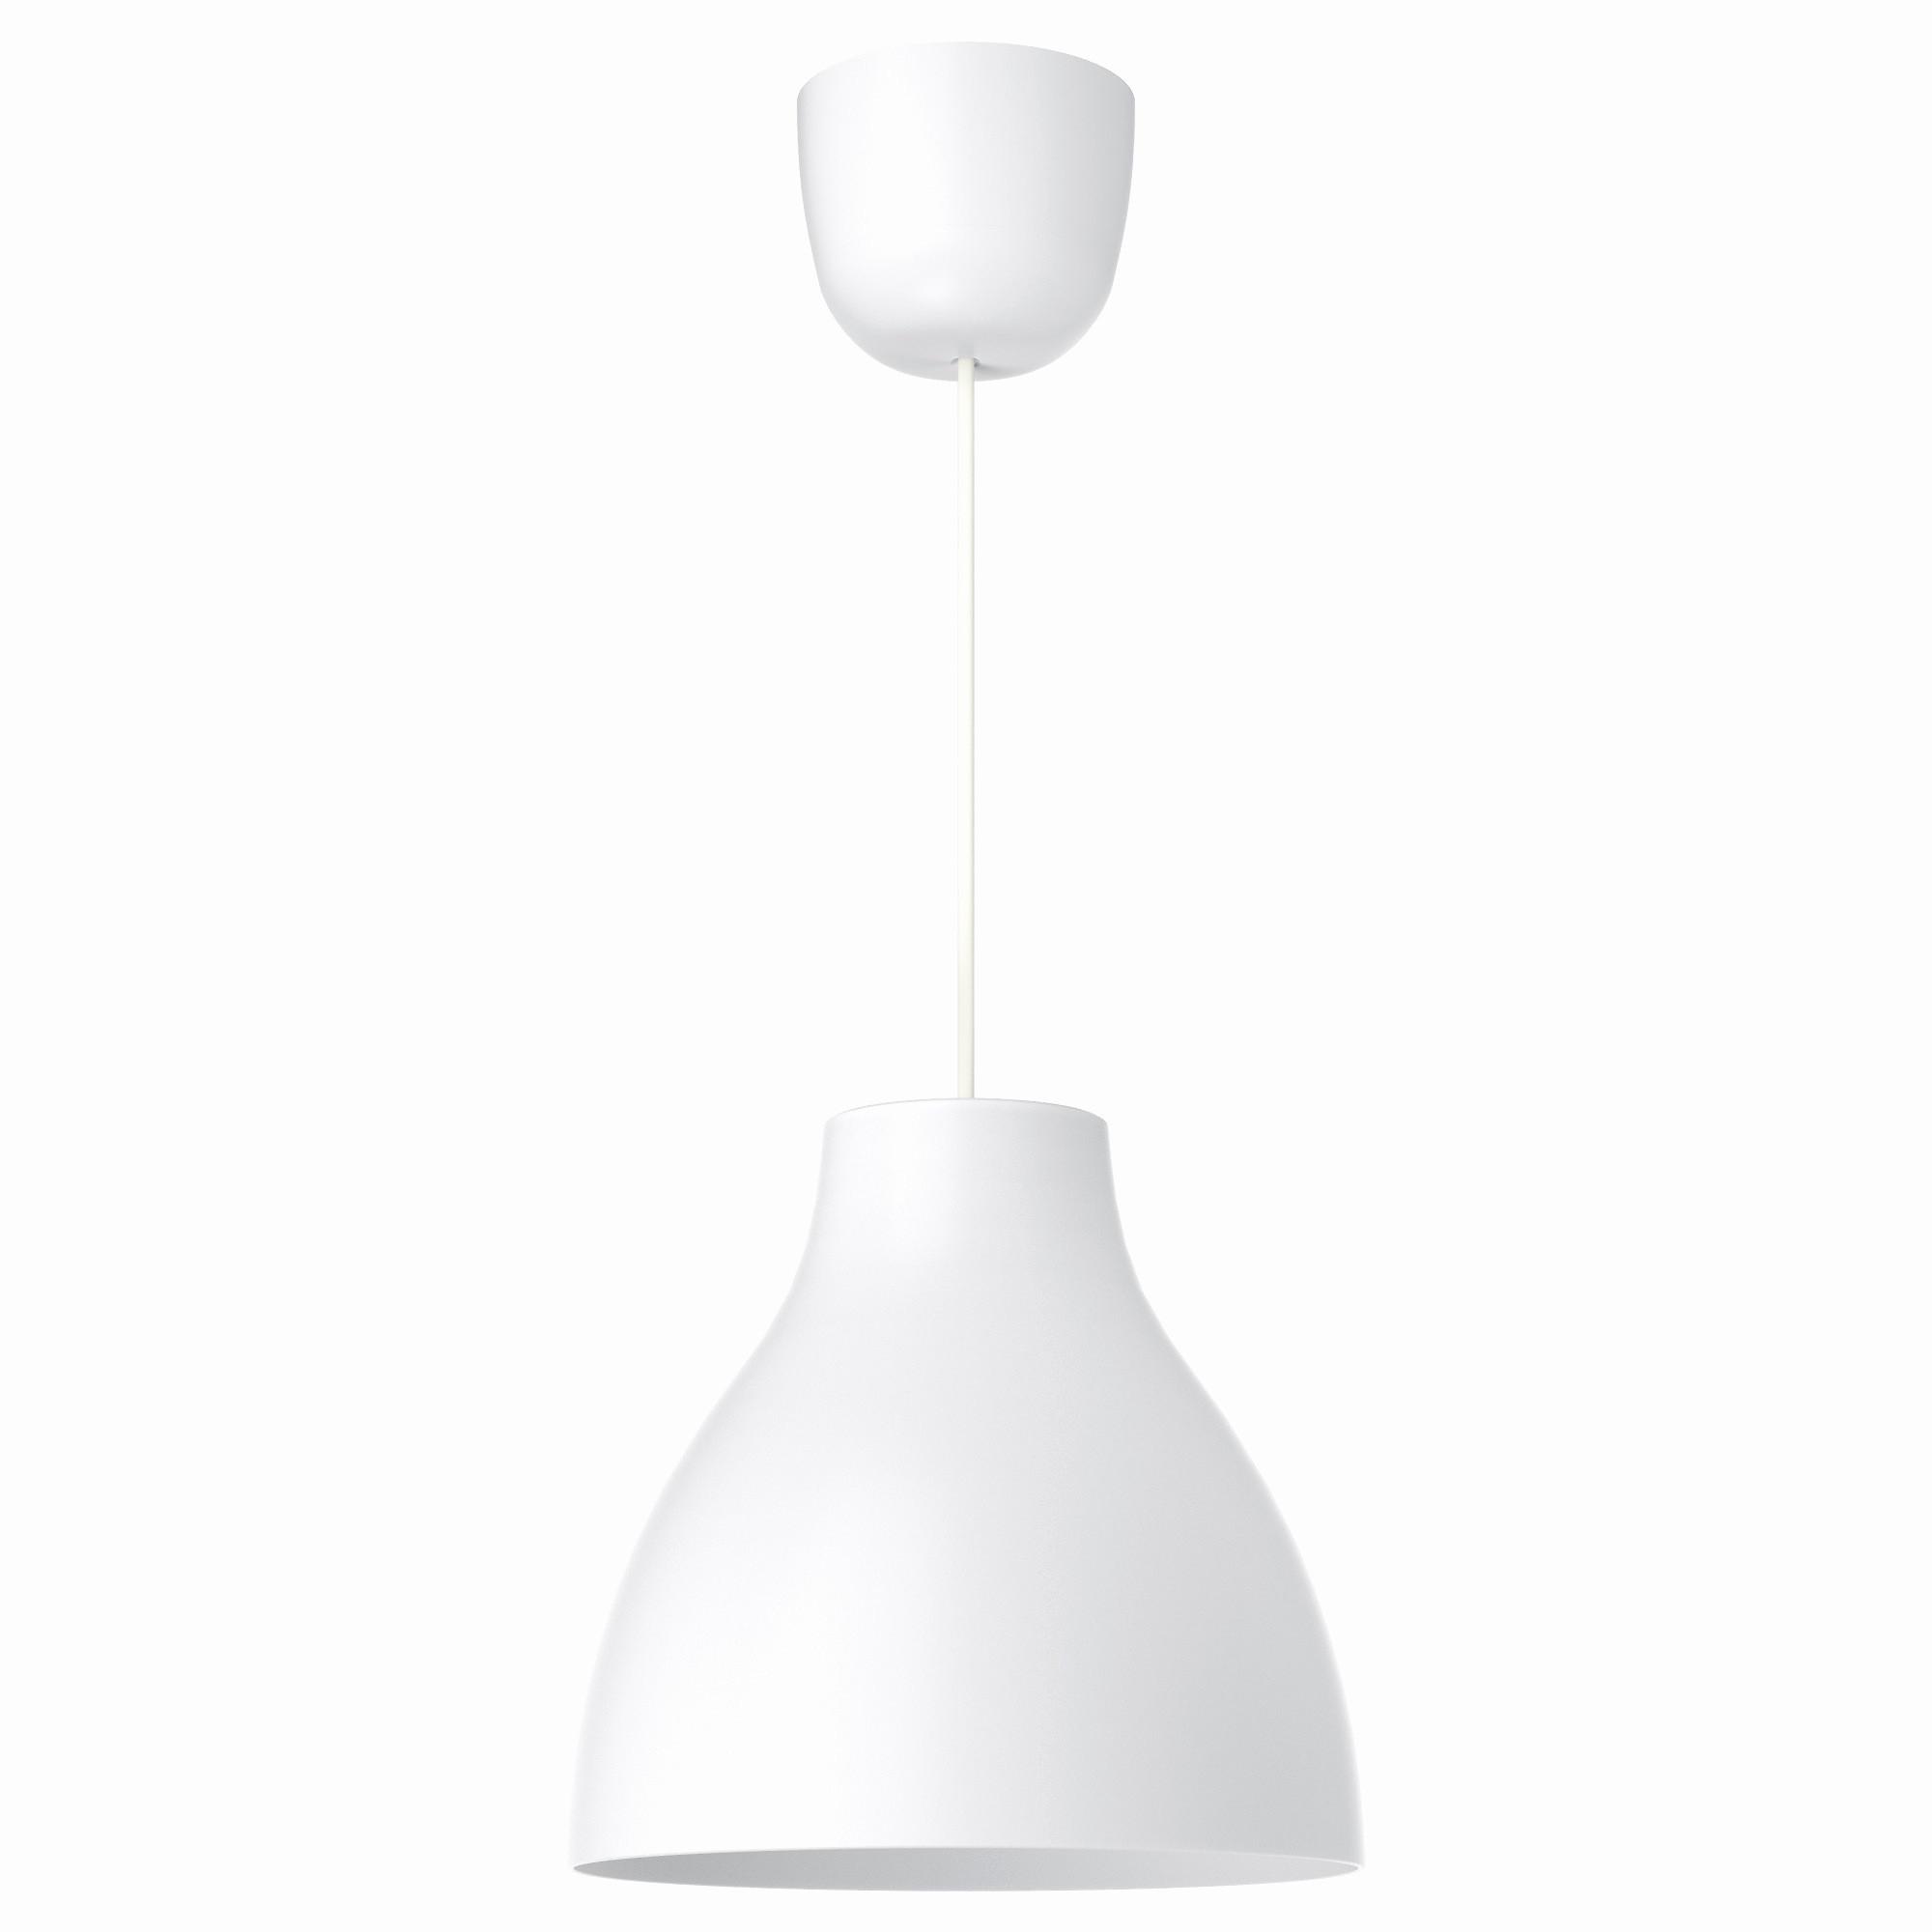 Ikea Applique Salle De Bain Luxe Stock Le Plus Applique Exterieur Ikea Idée – Sullivanmaxx